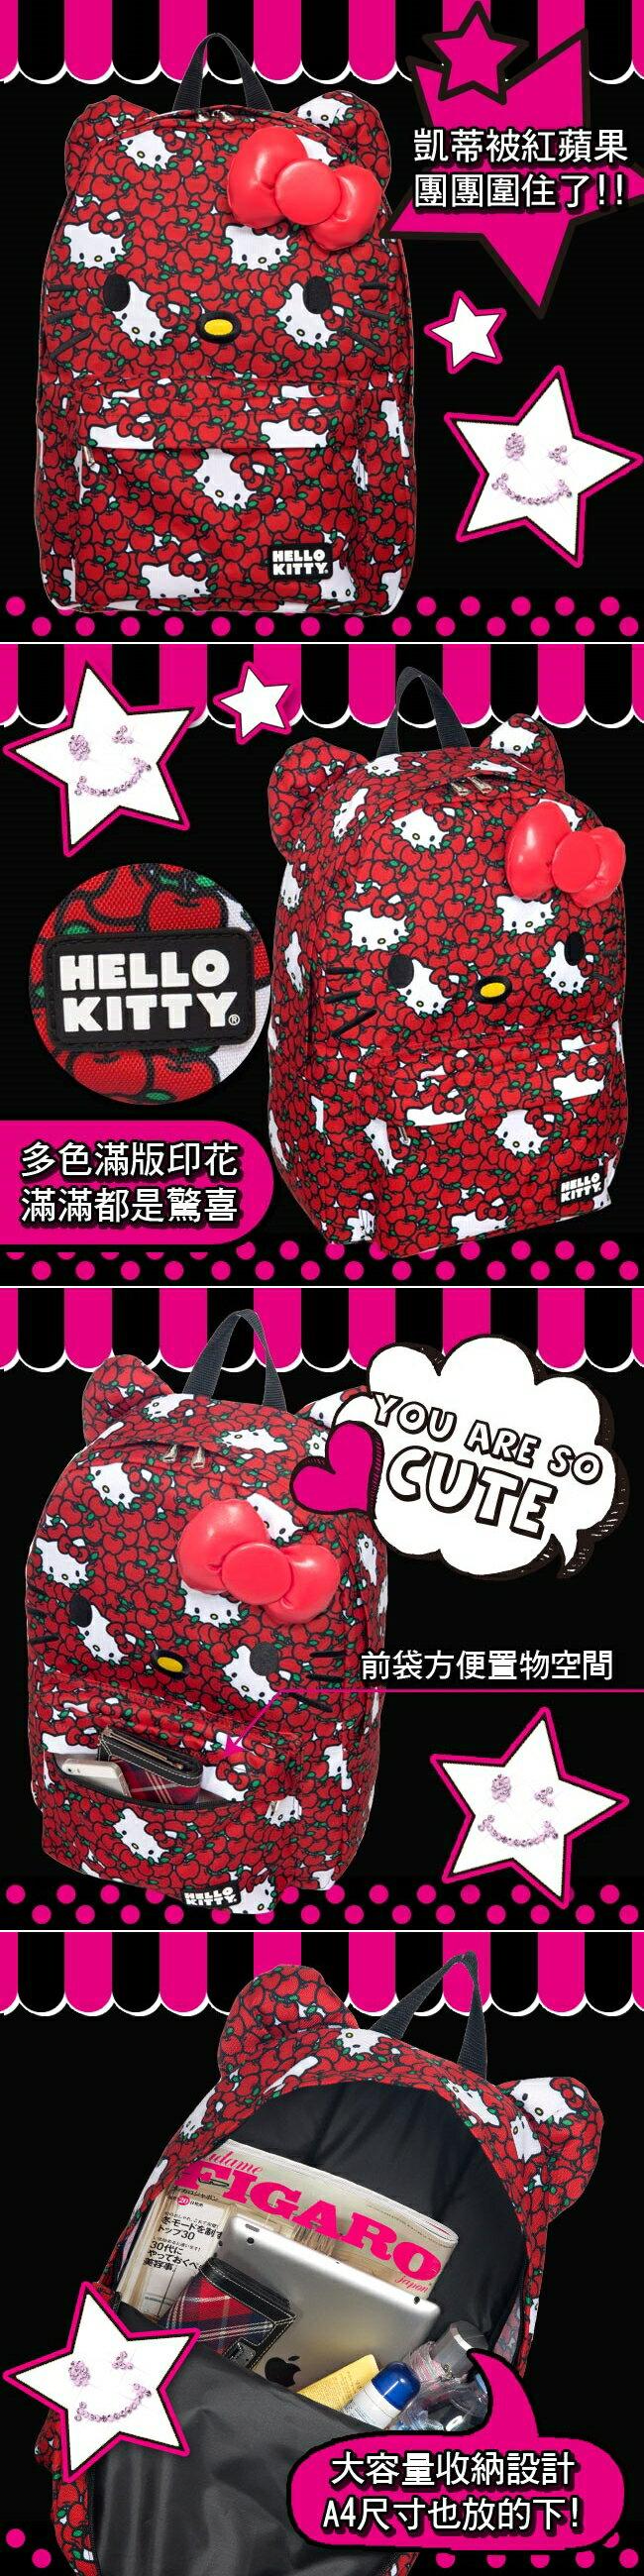 15010100012 LF聯名後背包-滿版蘋果紅結 三麗鷗 Hello Kitty 凱蒂貓  後背包 背包 真愛日本